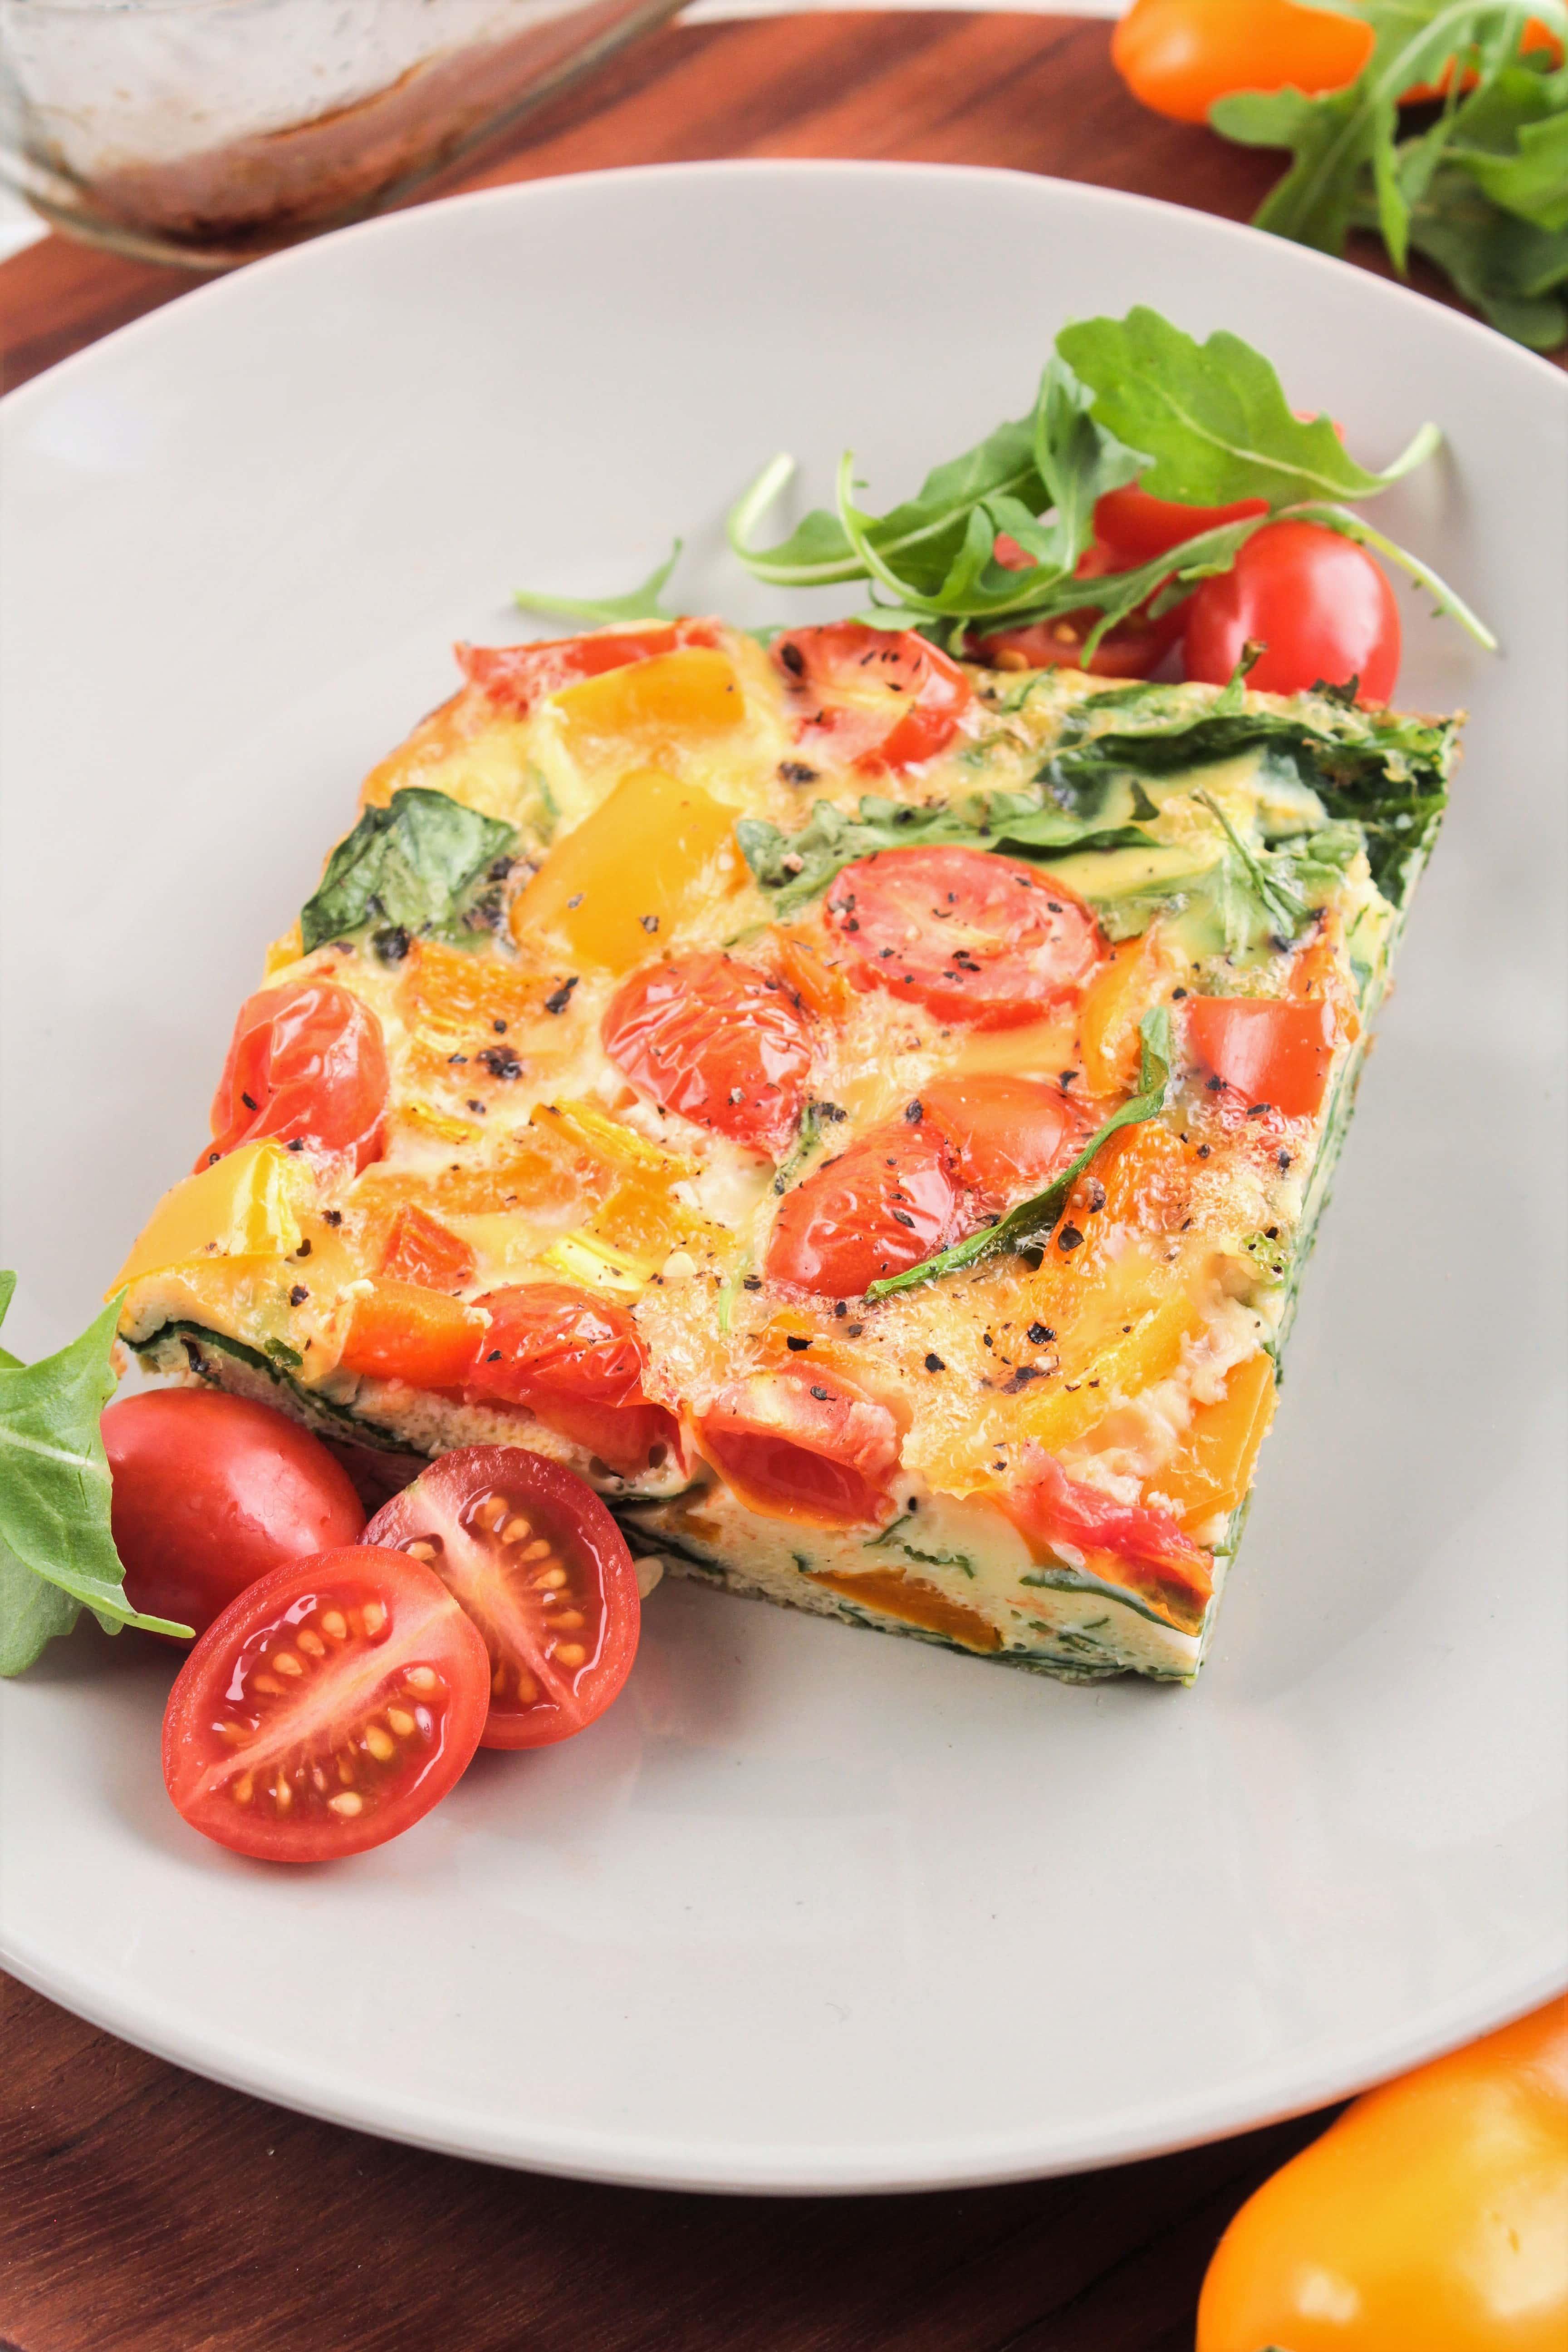 Make Ahead Veggie Egg Sandwiches